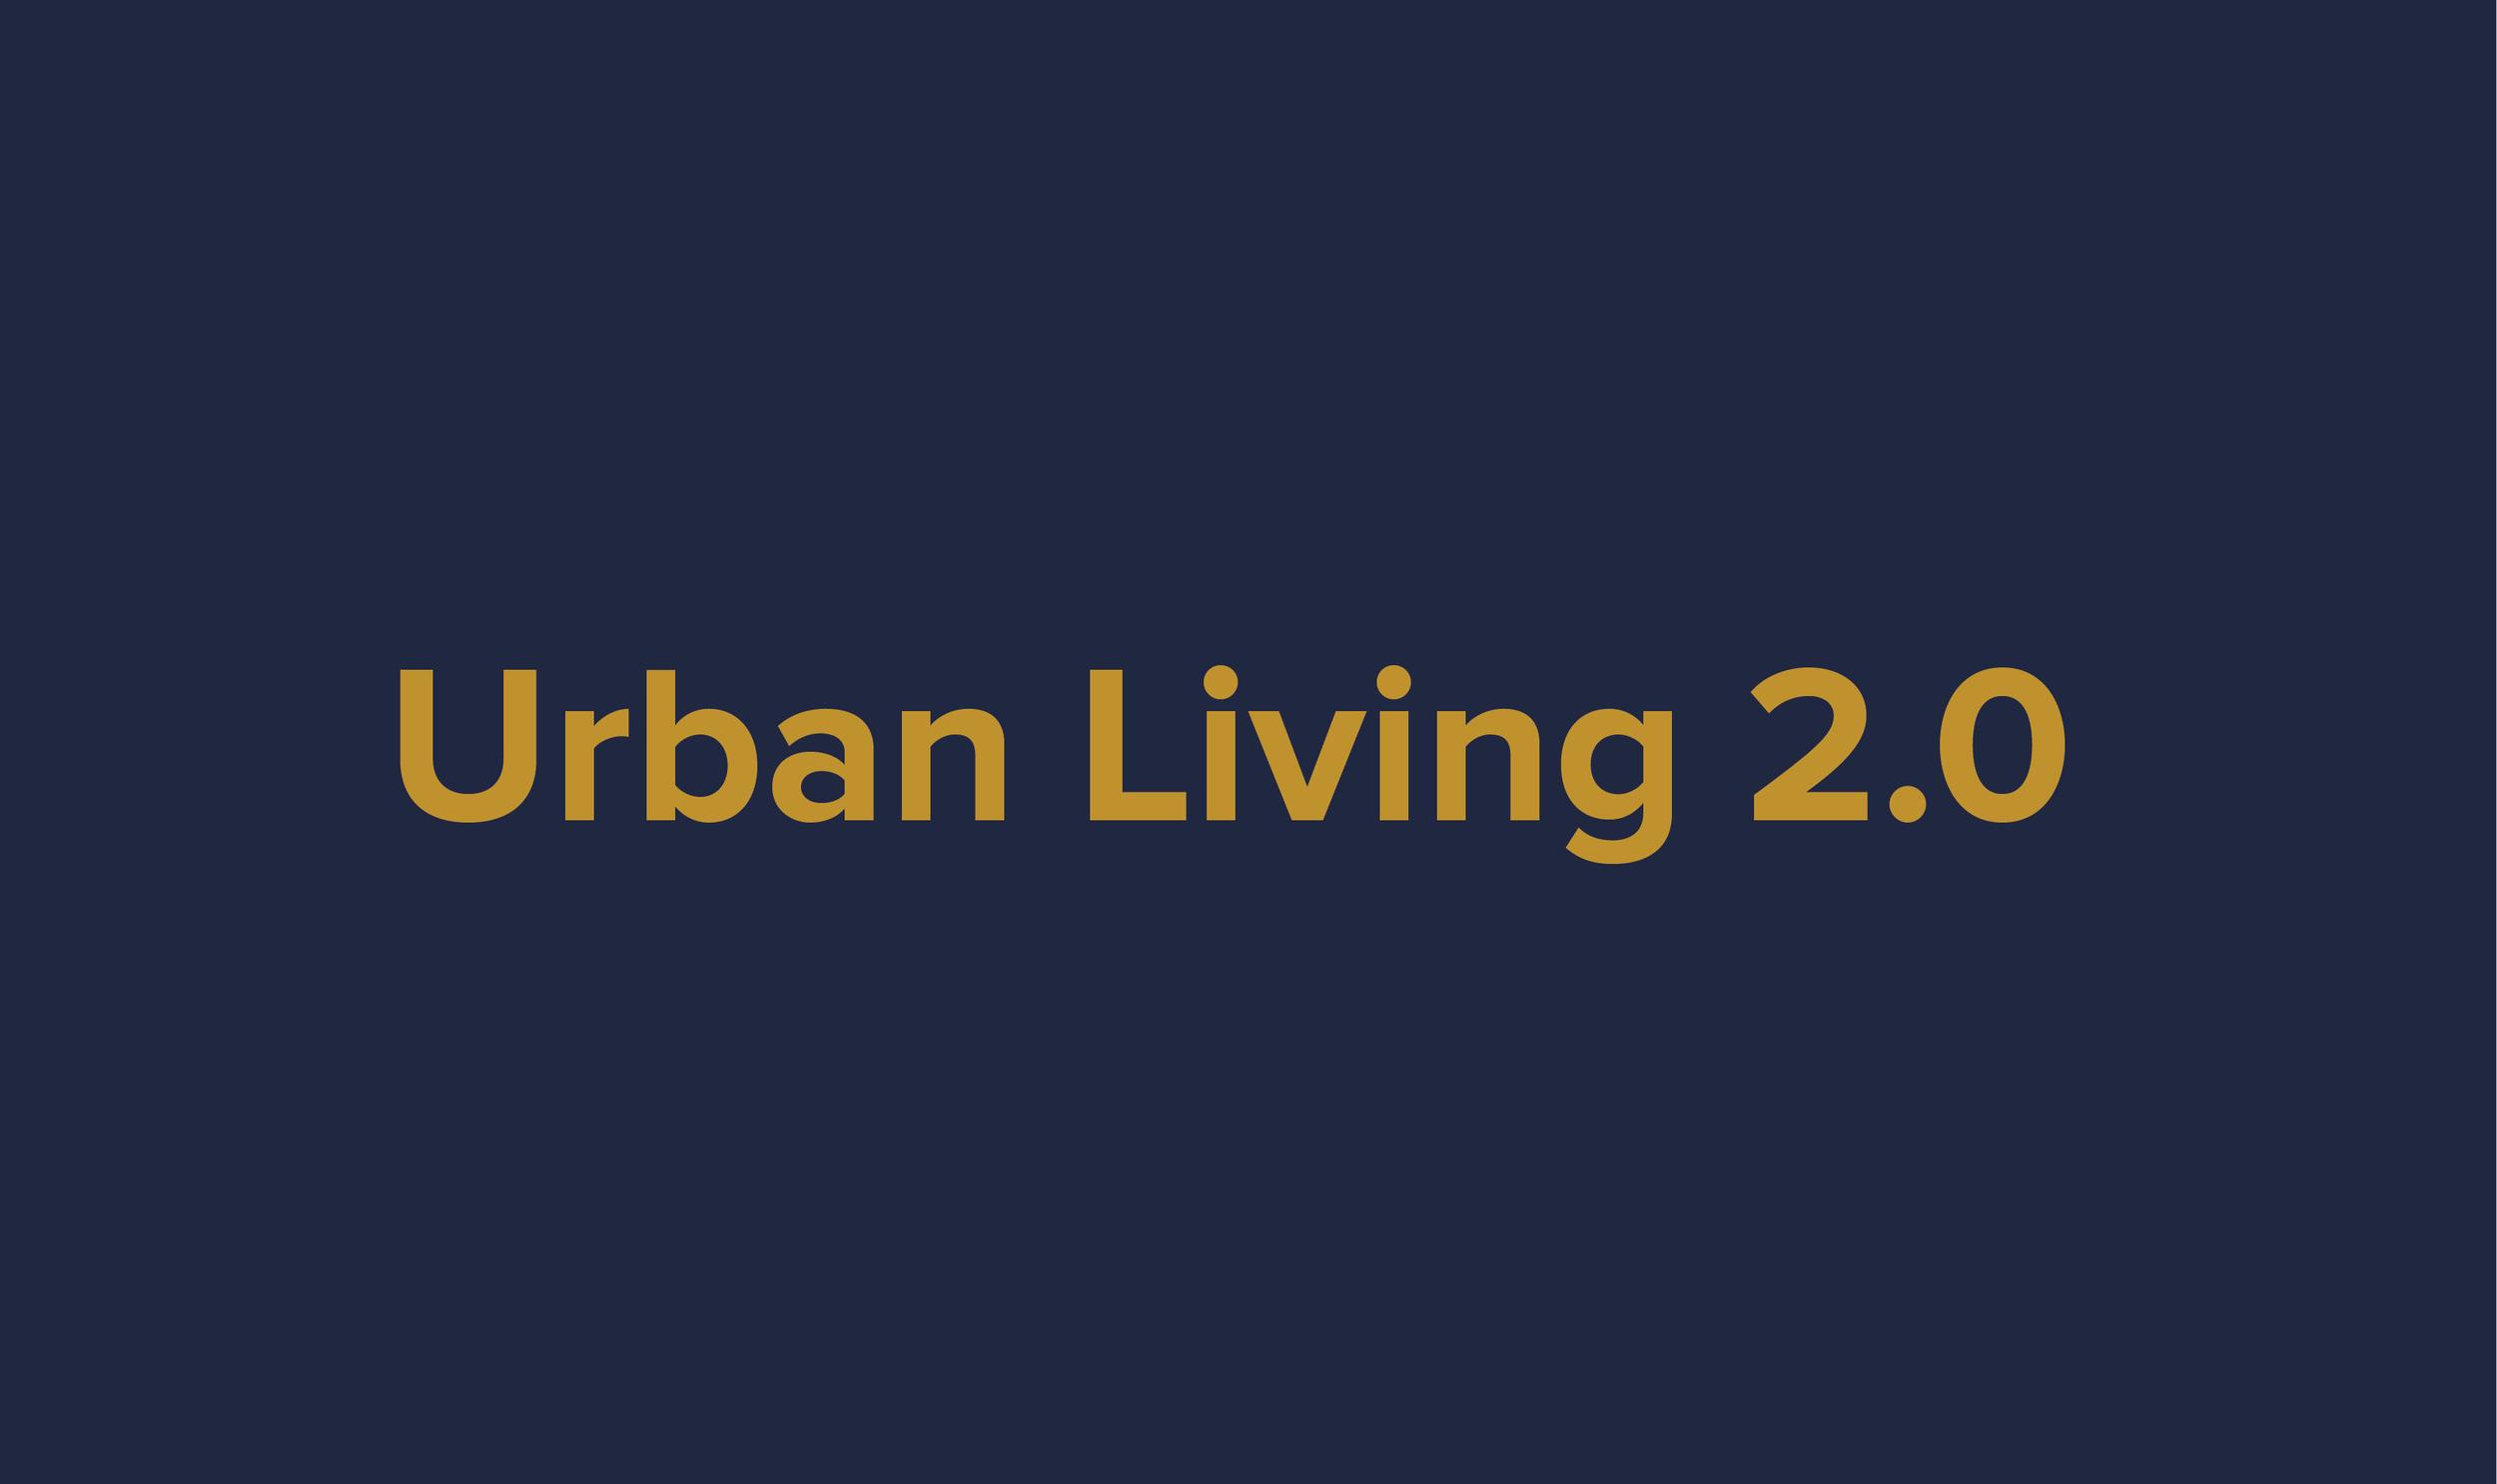 URBANLIVING-01.png